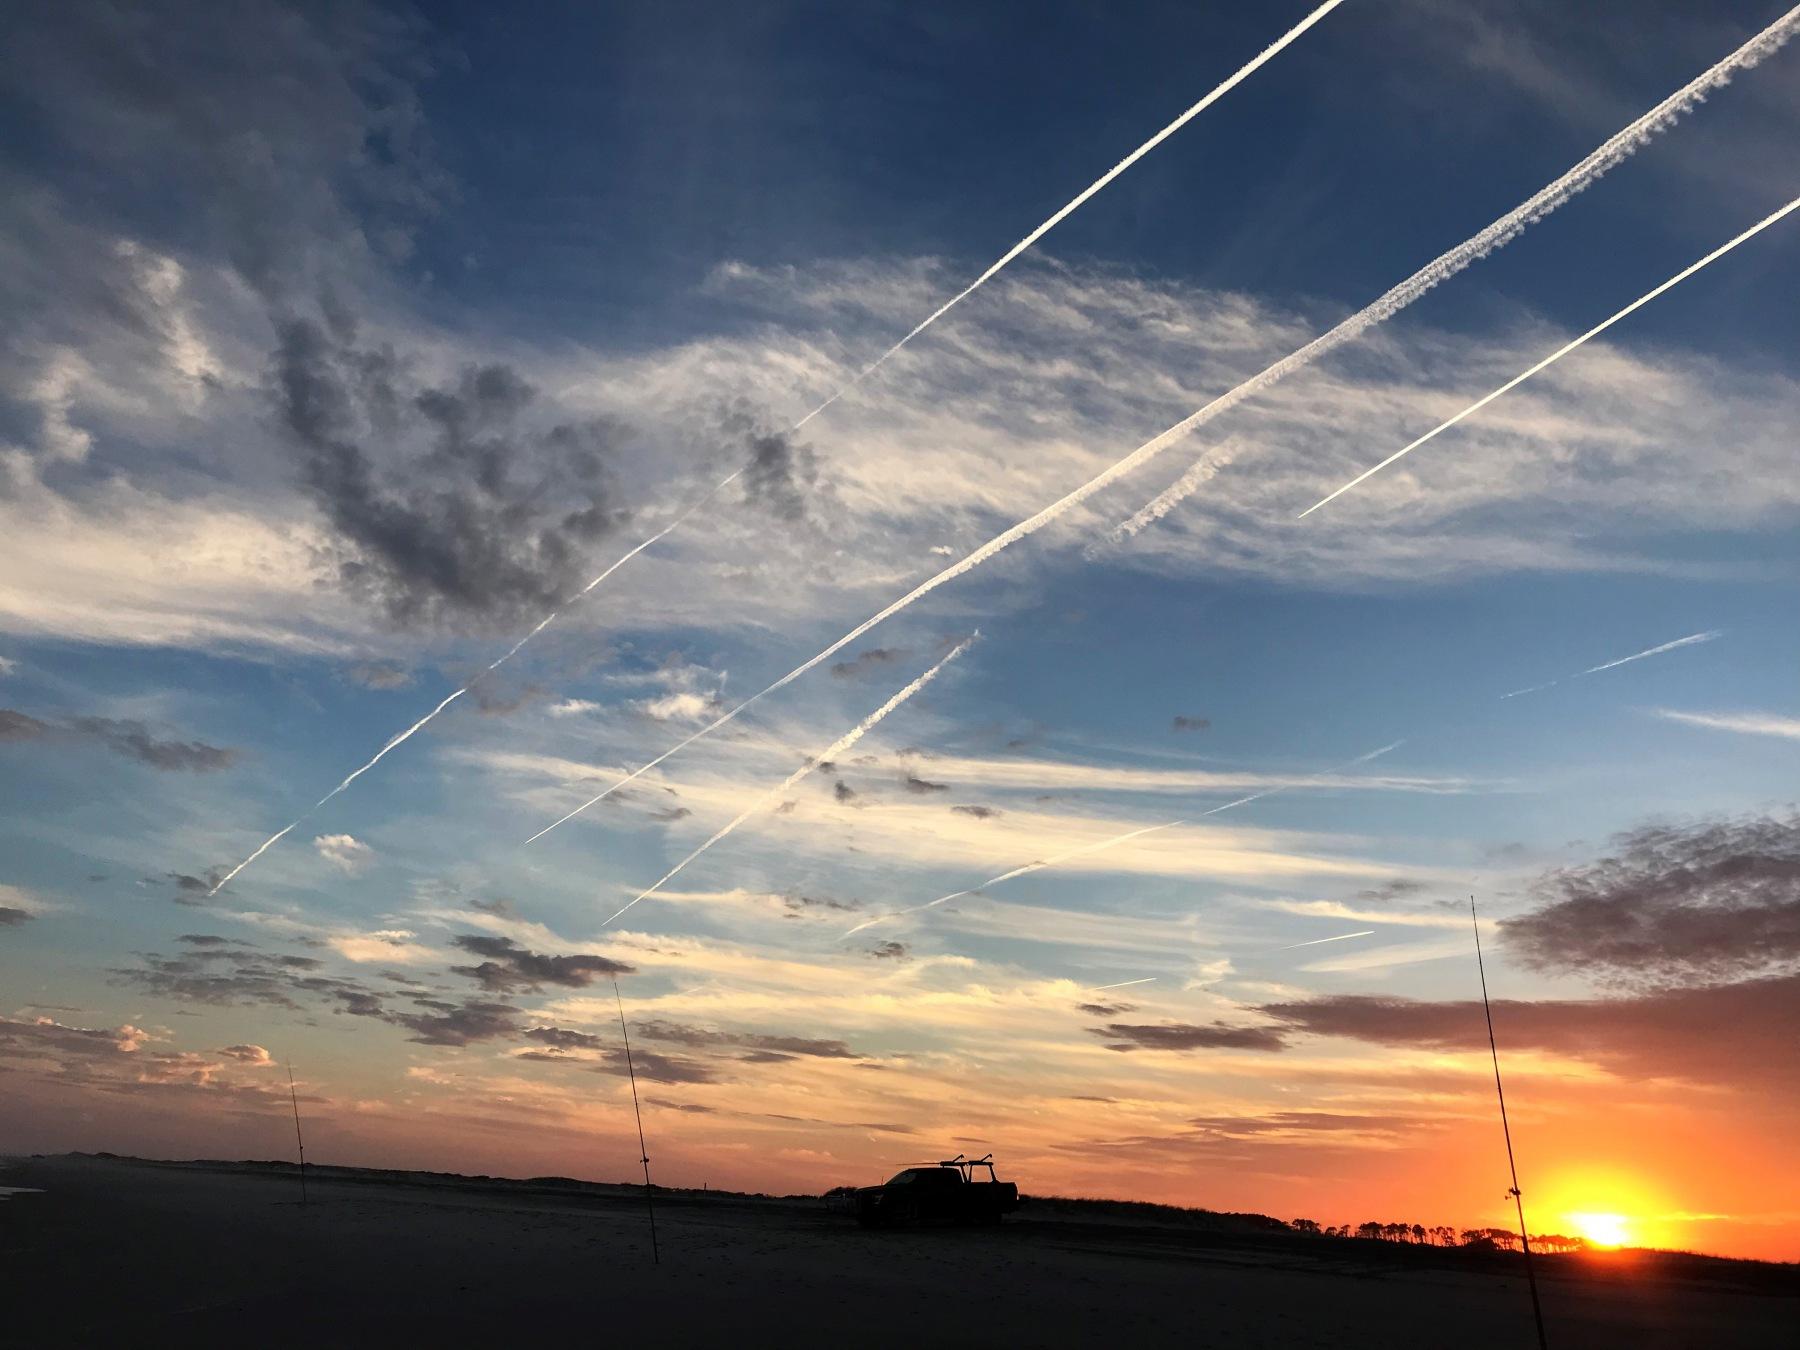 sunset_2.jpg.b3011f007407e989a290ff35829cc3f9.jpg